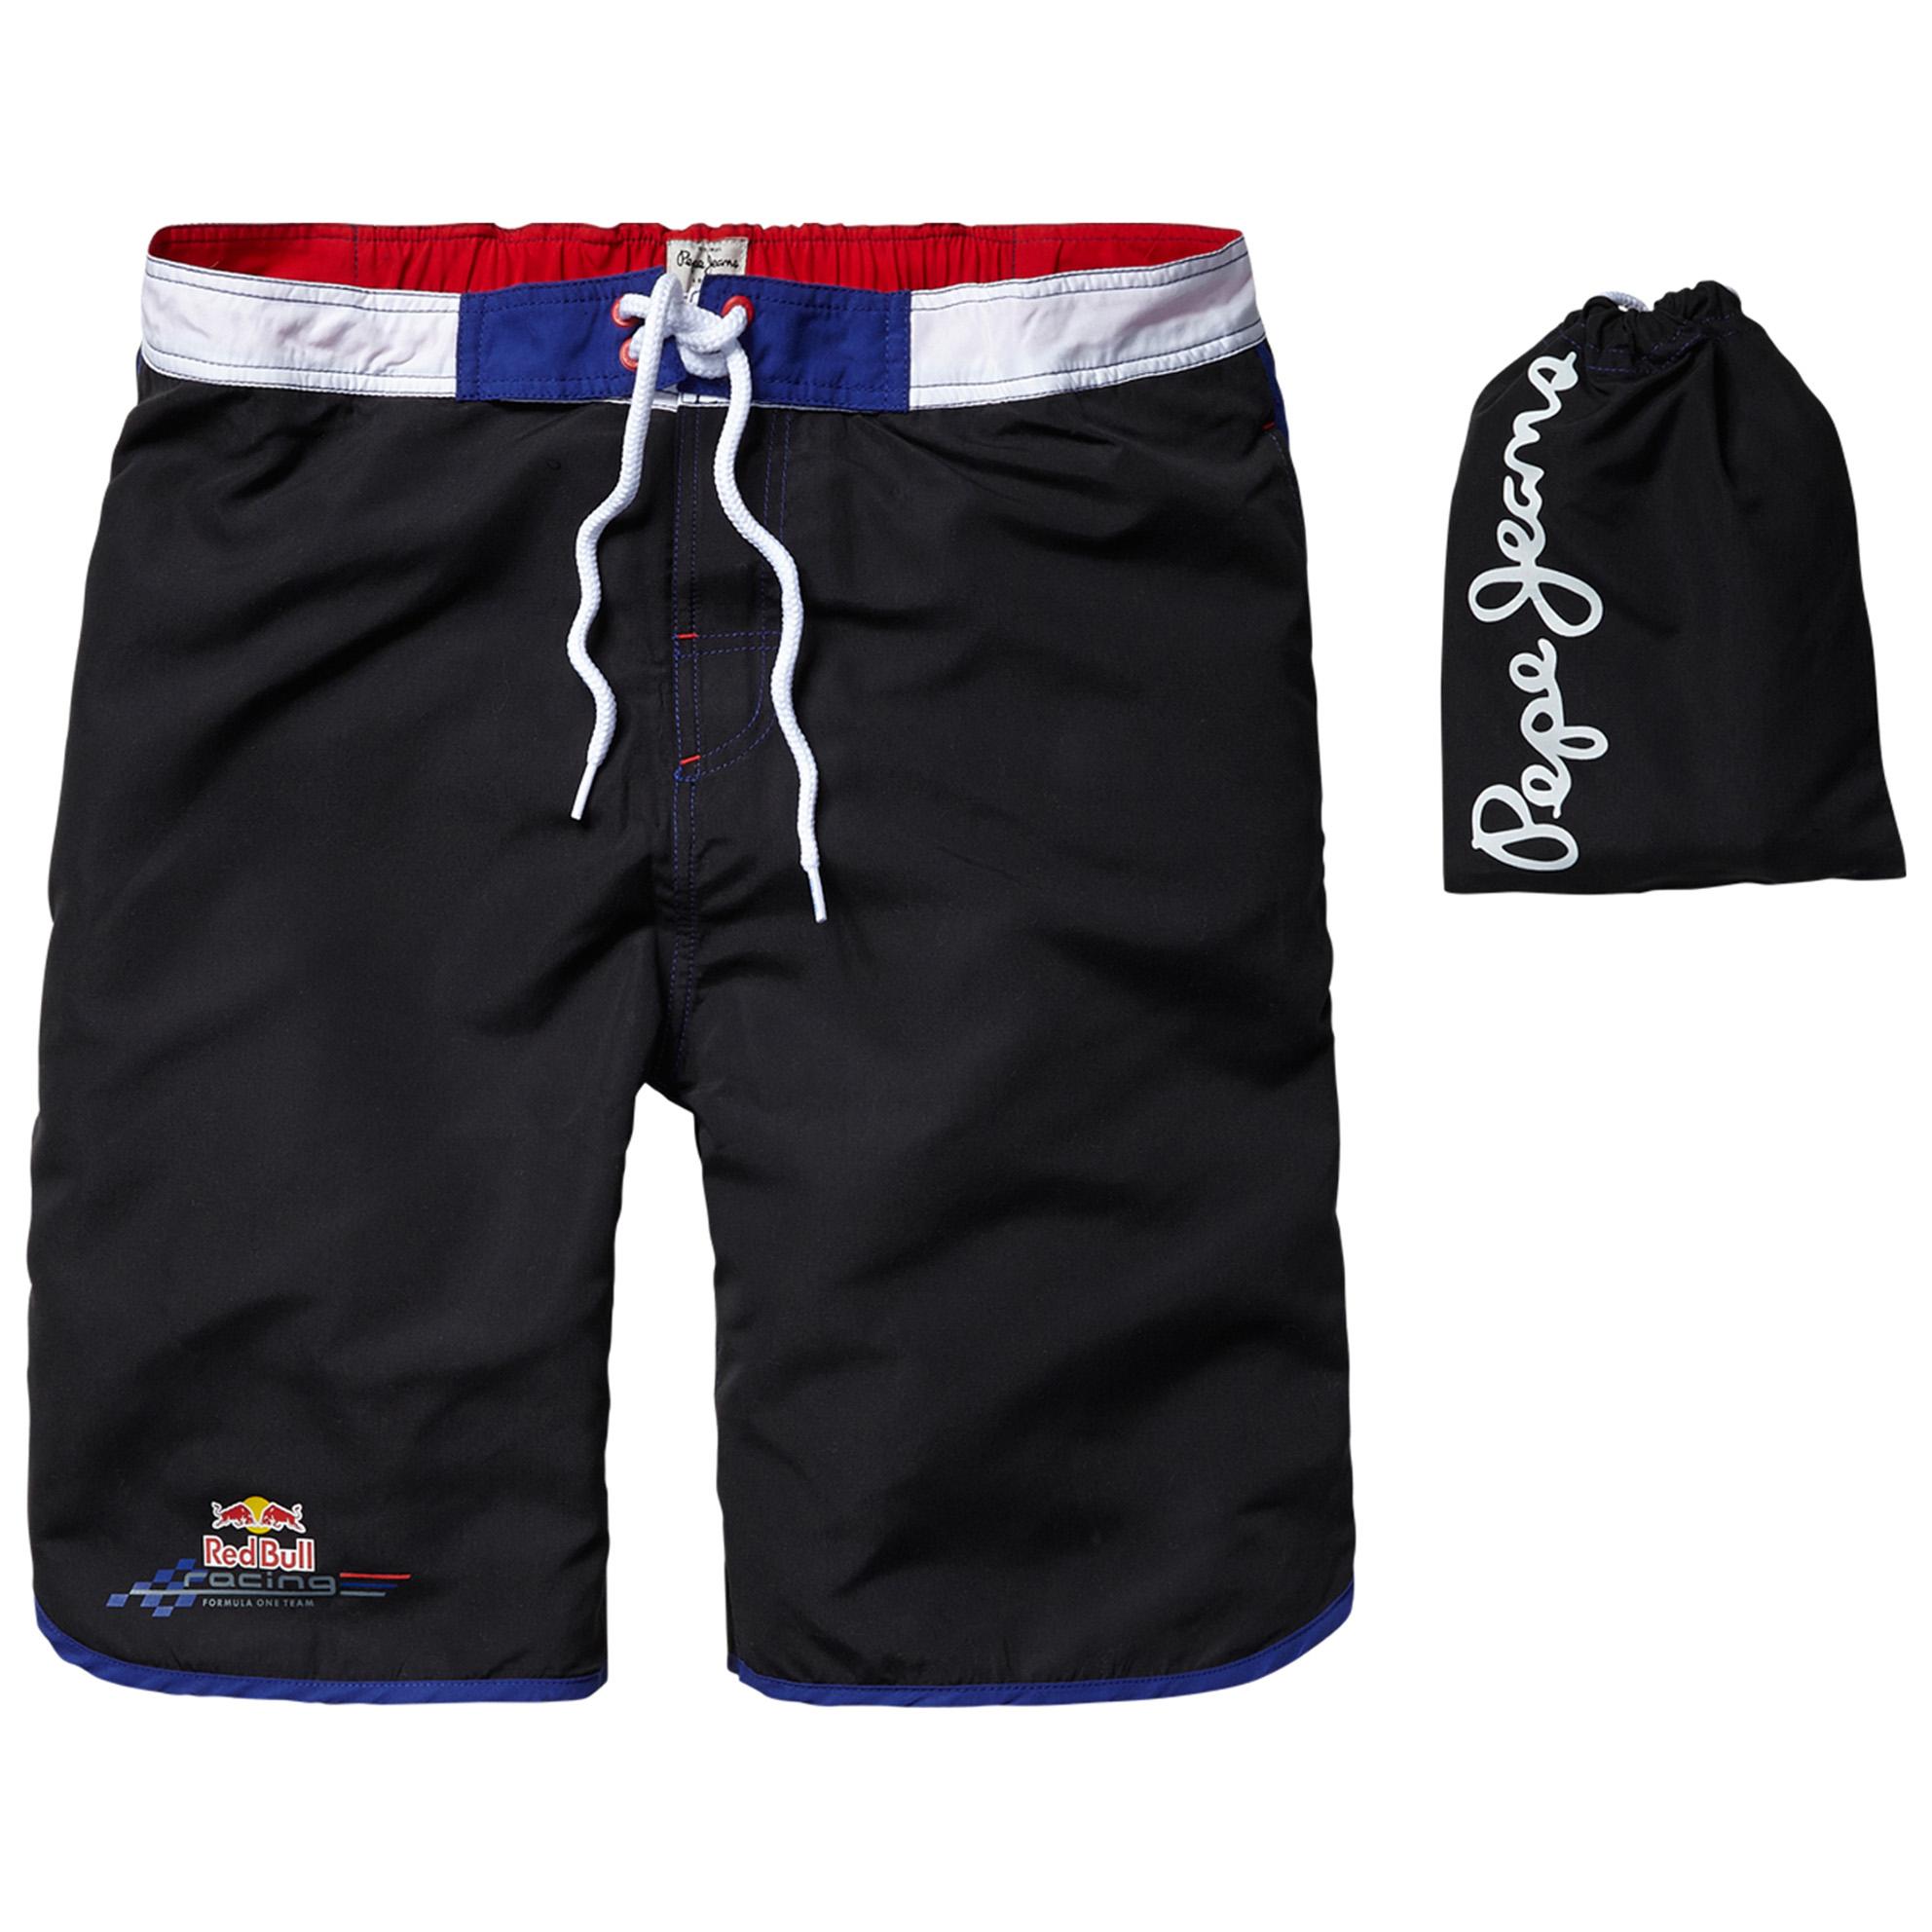 Infiniti Red Bull Racing by Pepe Jeans Crankshaft Board Shorts